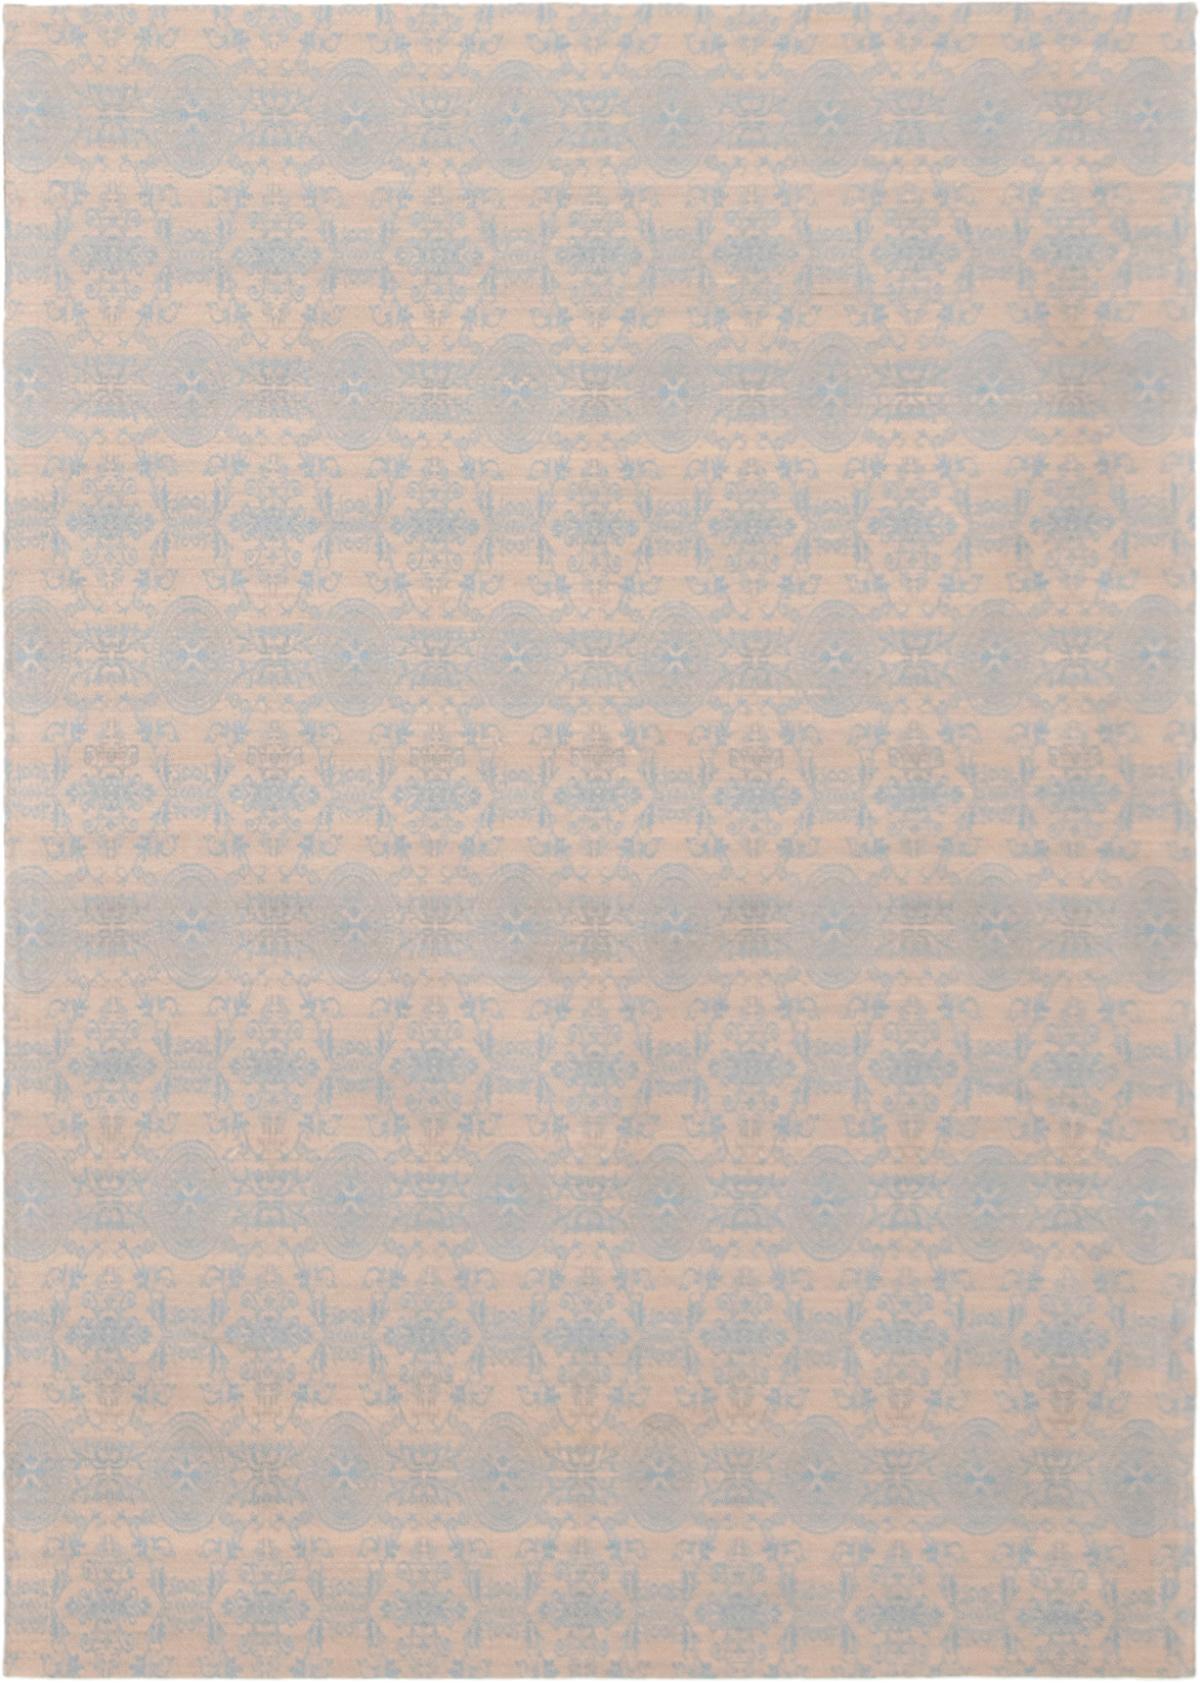 "Handmade Collage Light Khaki, Sky Blue Chenille Rug 4'9"" x 6'9"" Size: 4'9"" x 6'9"""